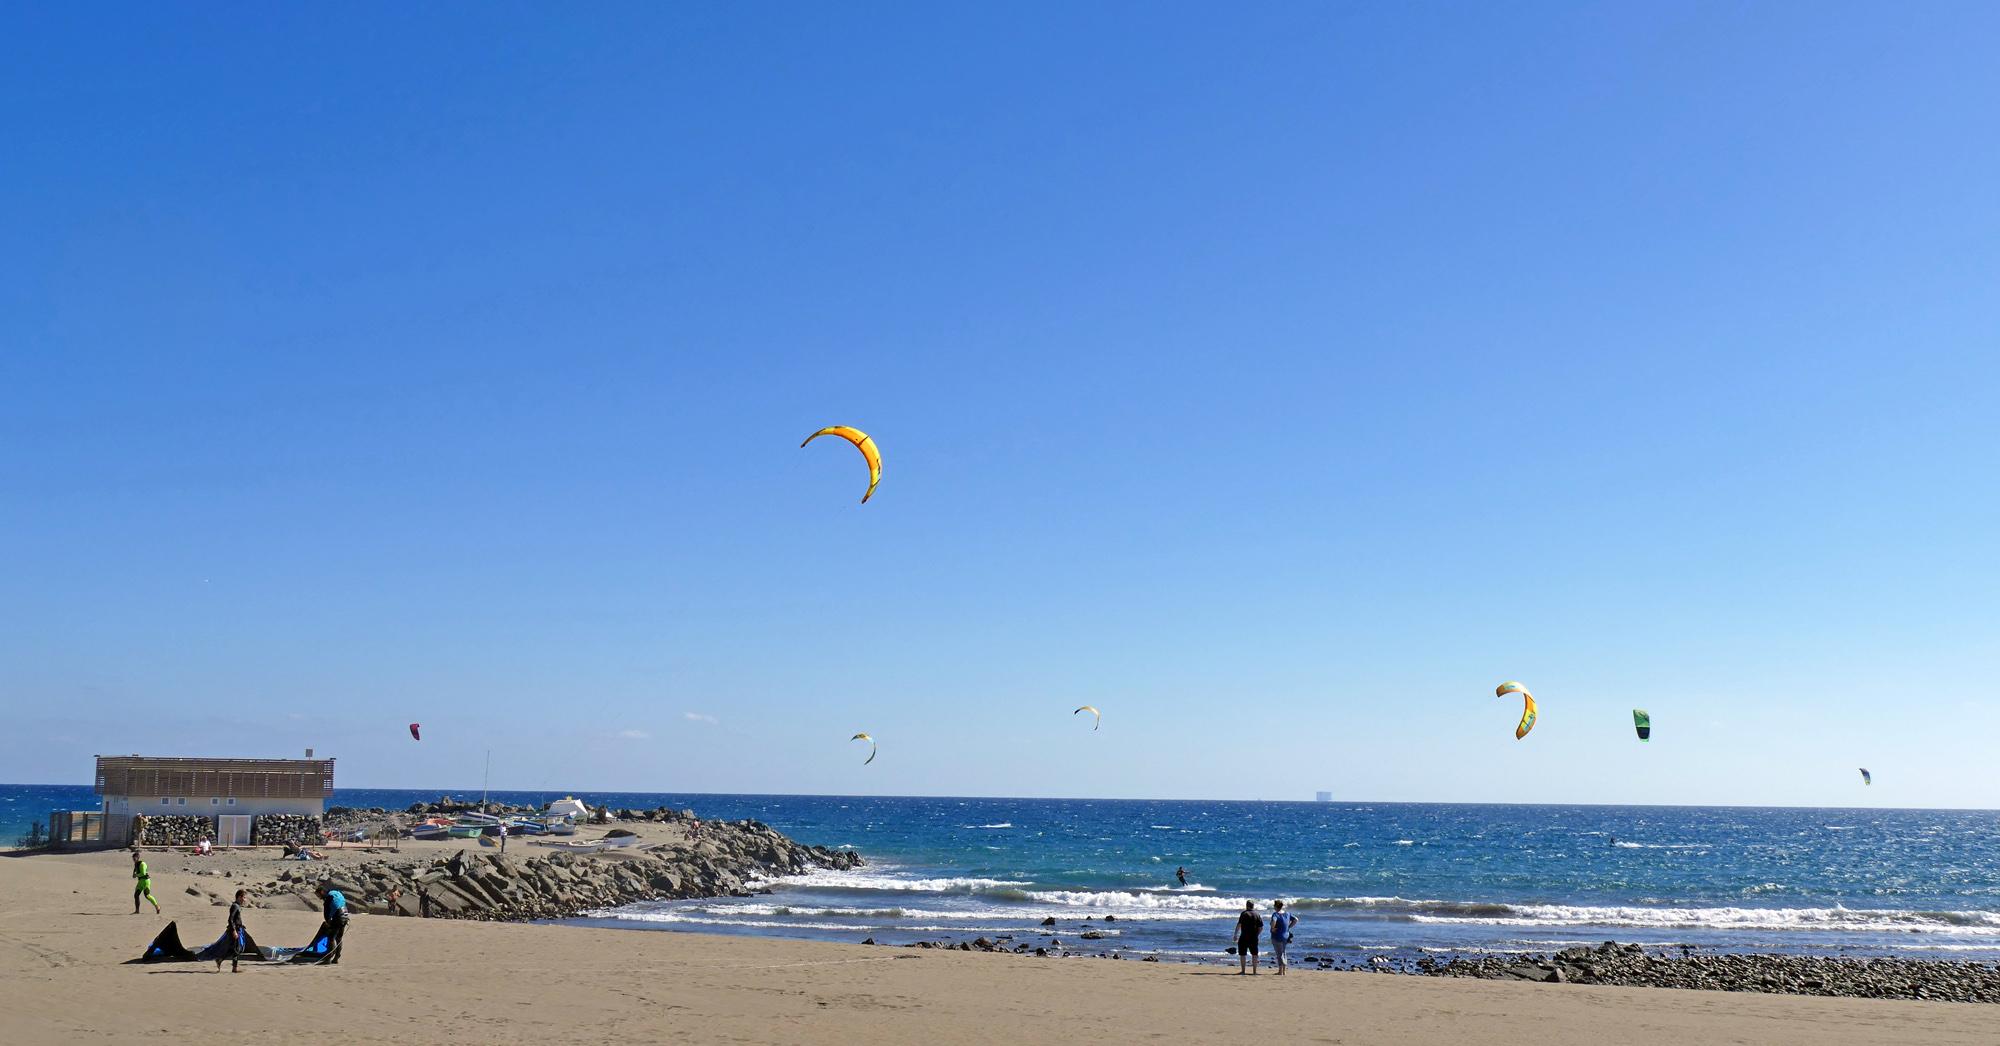 playa del ingles kitesurfing